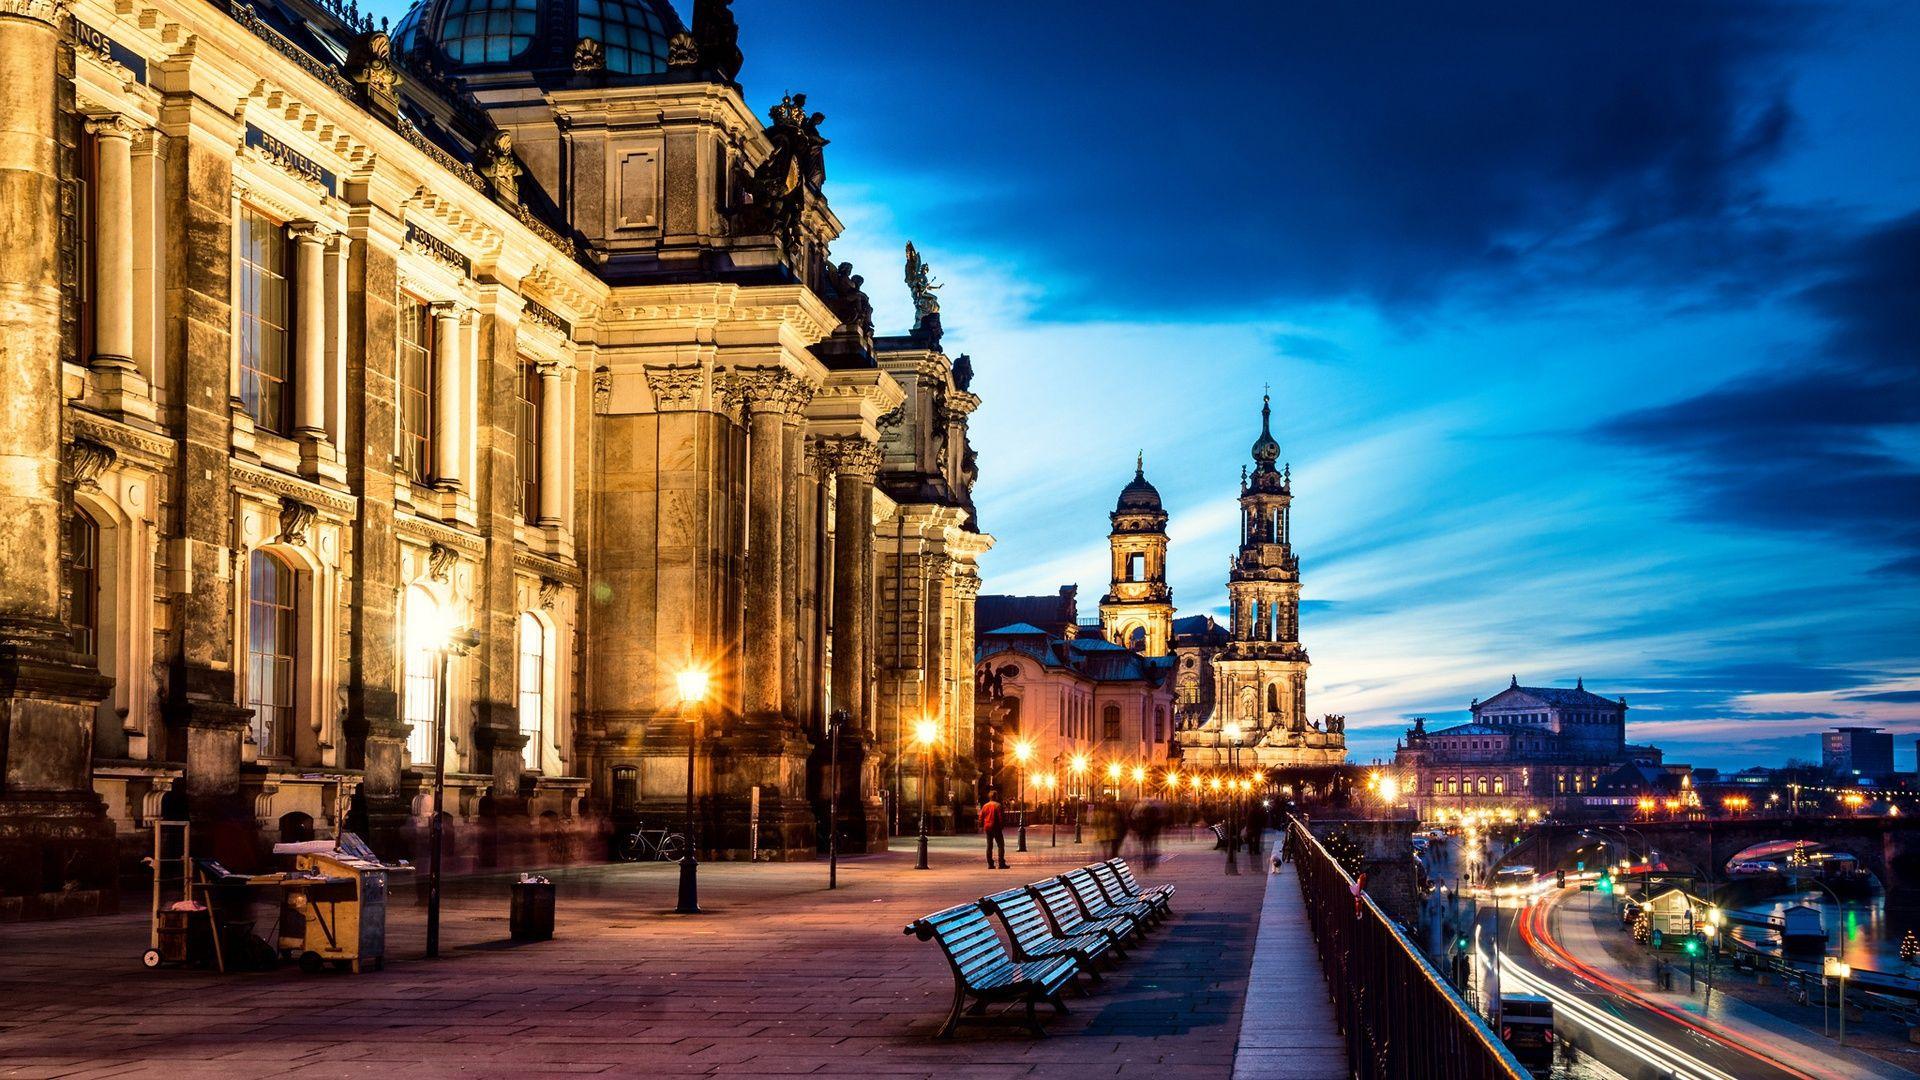 Berlin Wallpaper Desktop Background Is 4k Wallpaper Yodobi Cities In Europe Places Around The World France City